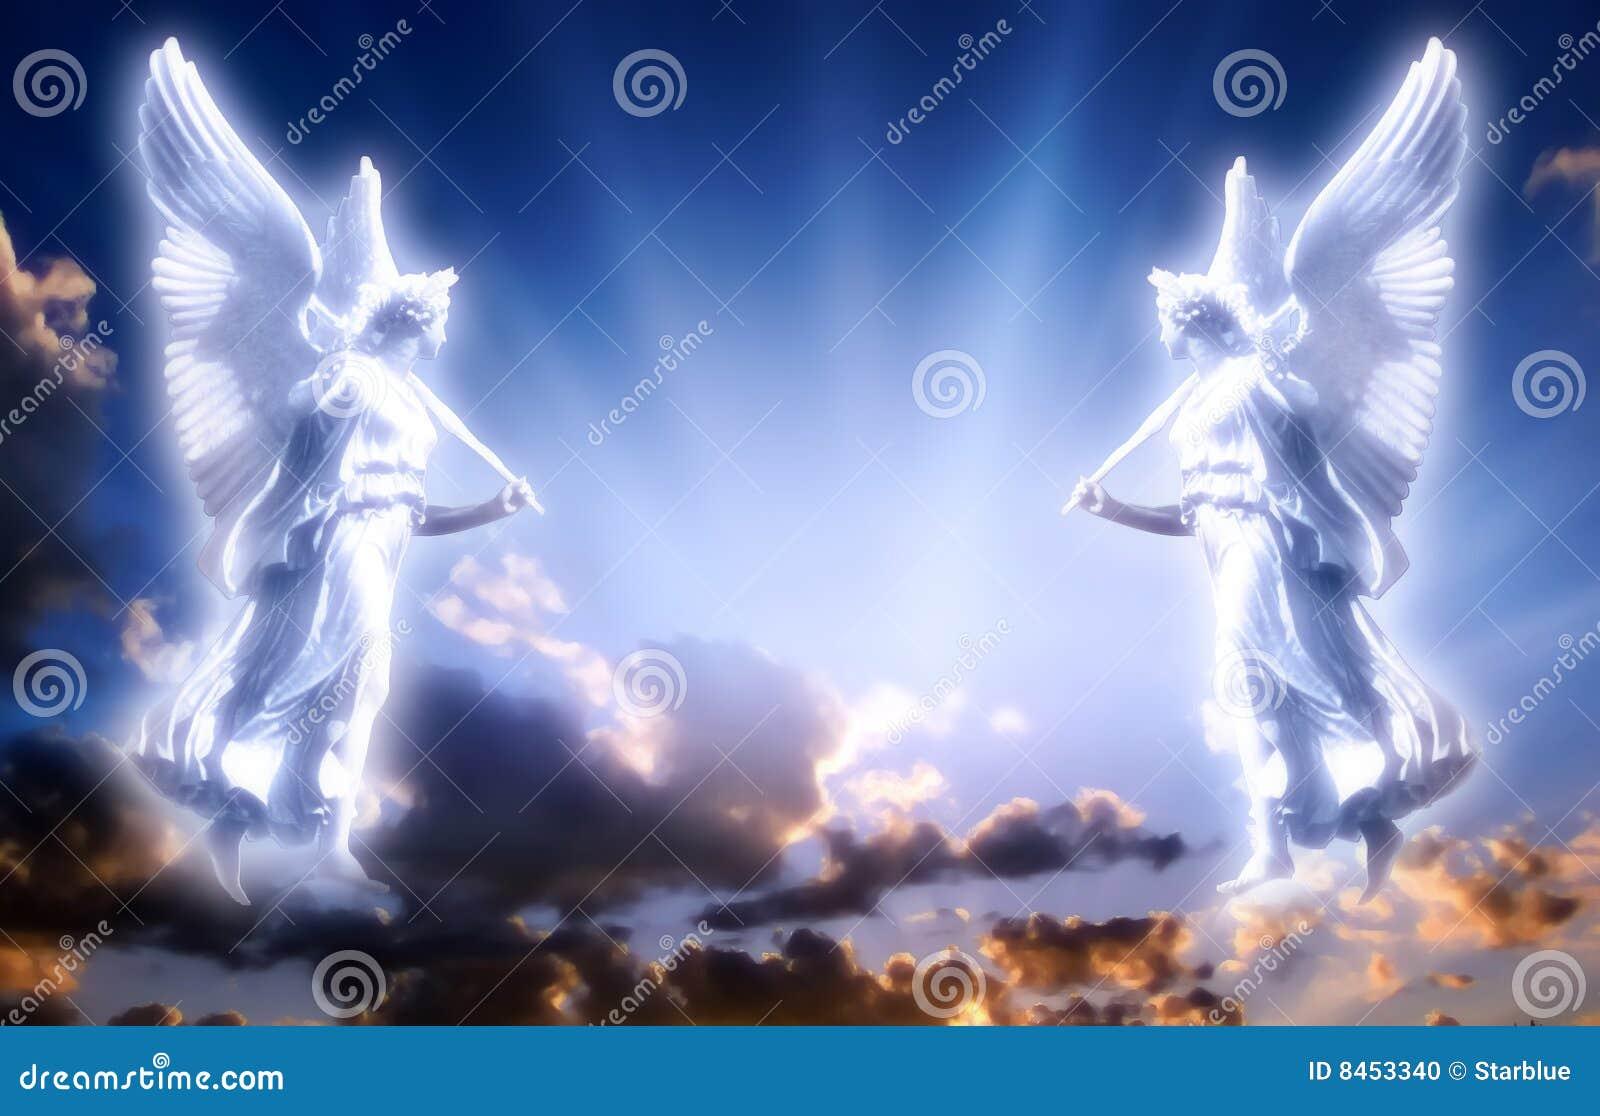 Angeli con indicatore luminoso divino